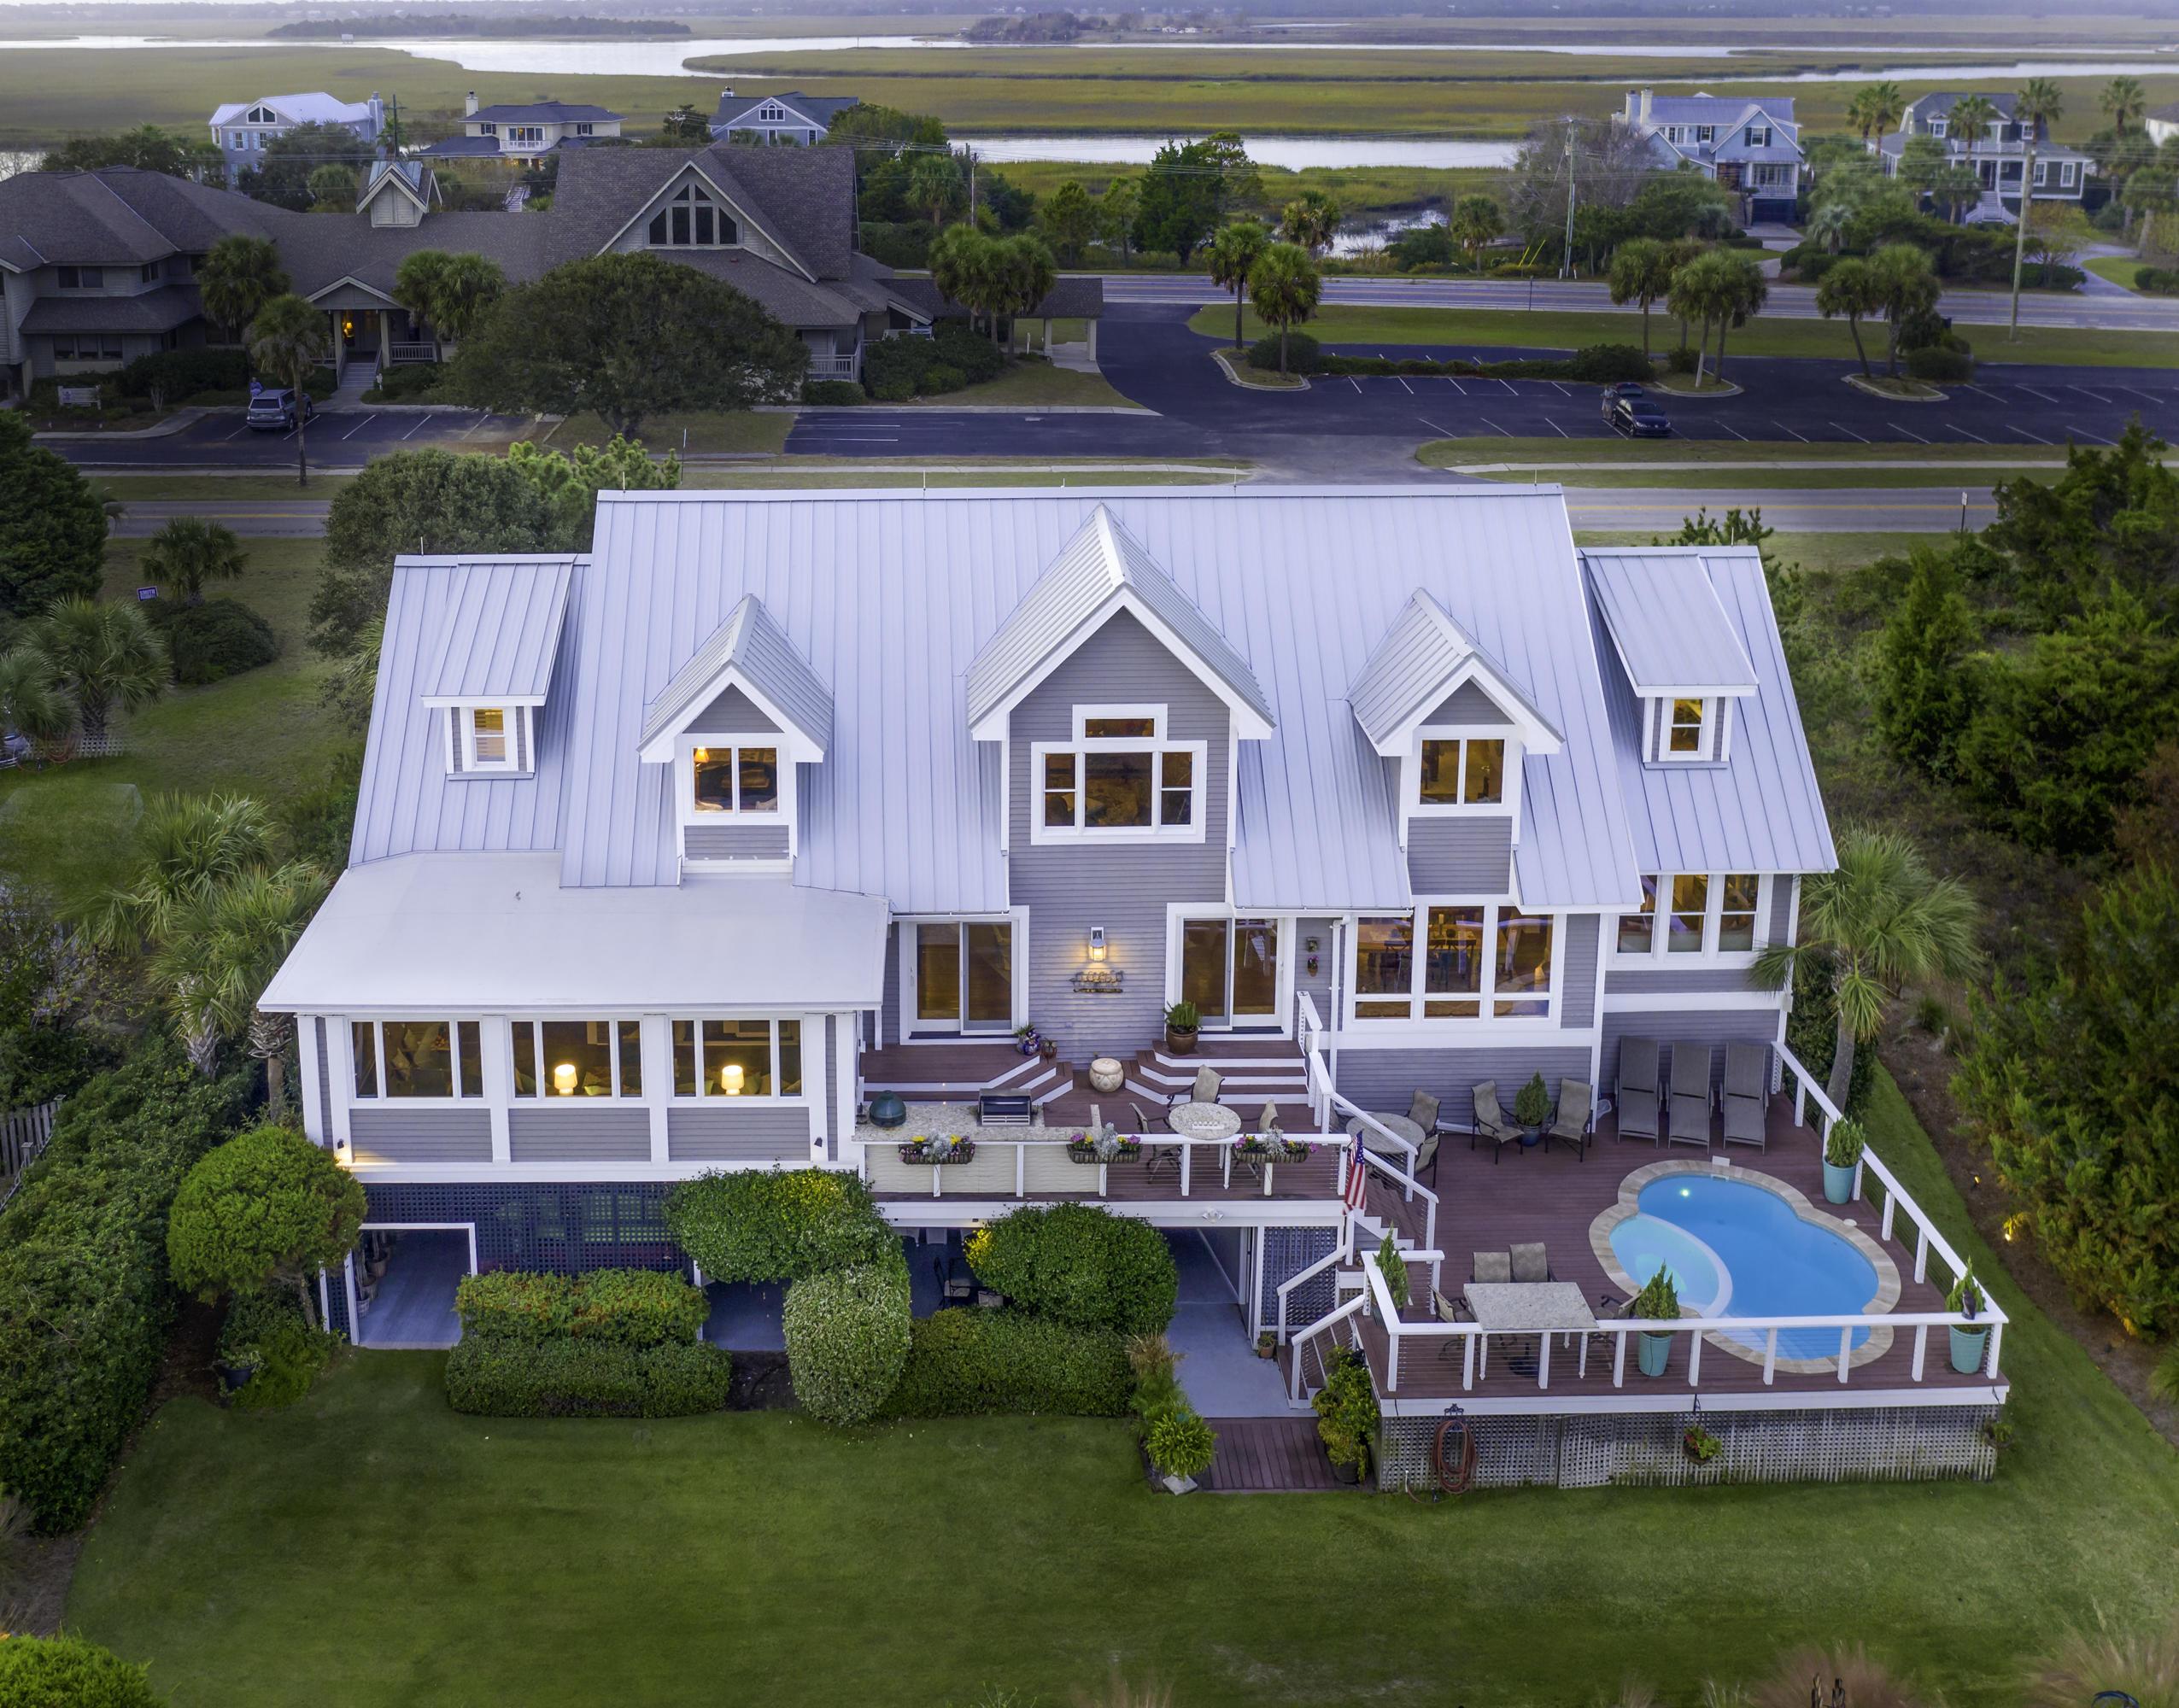 Sullivans Island Homes For Sale - 3217 Middle, Sullivans Island, SC - 10